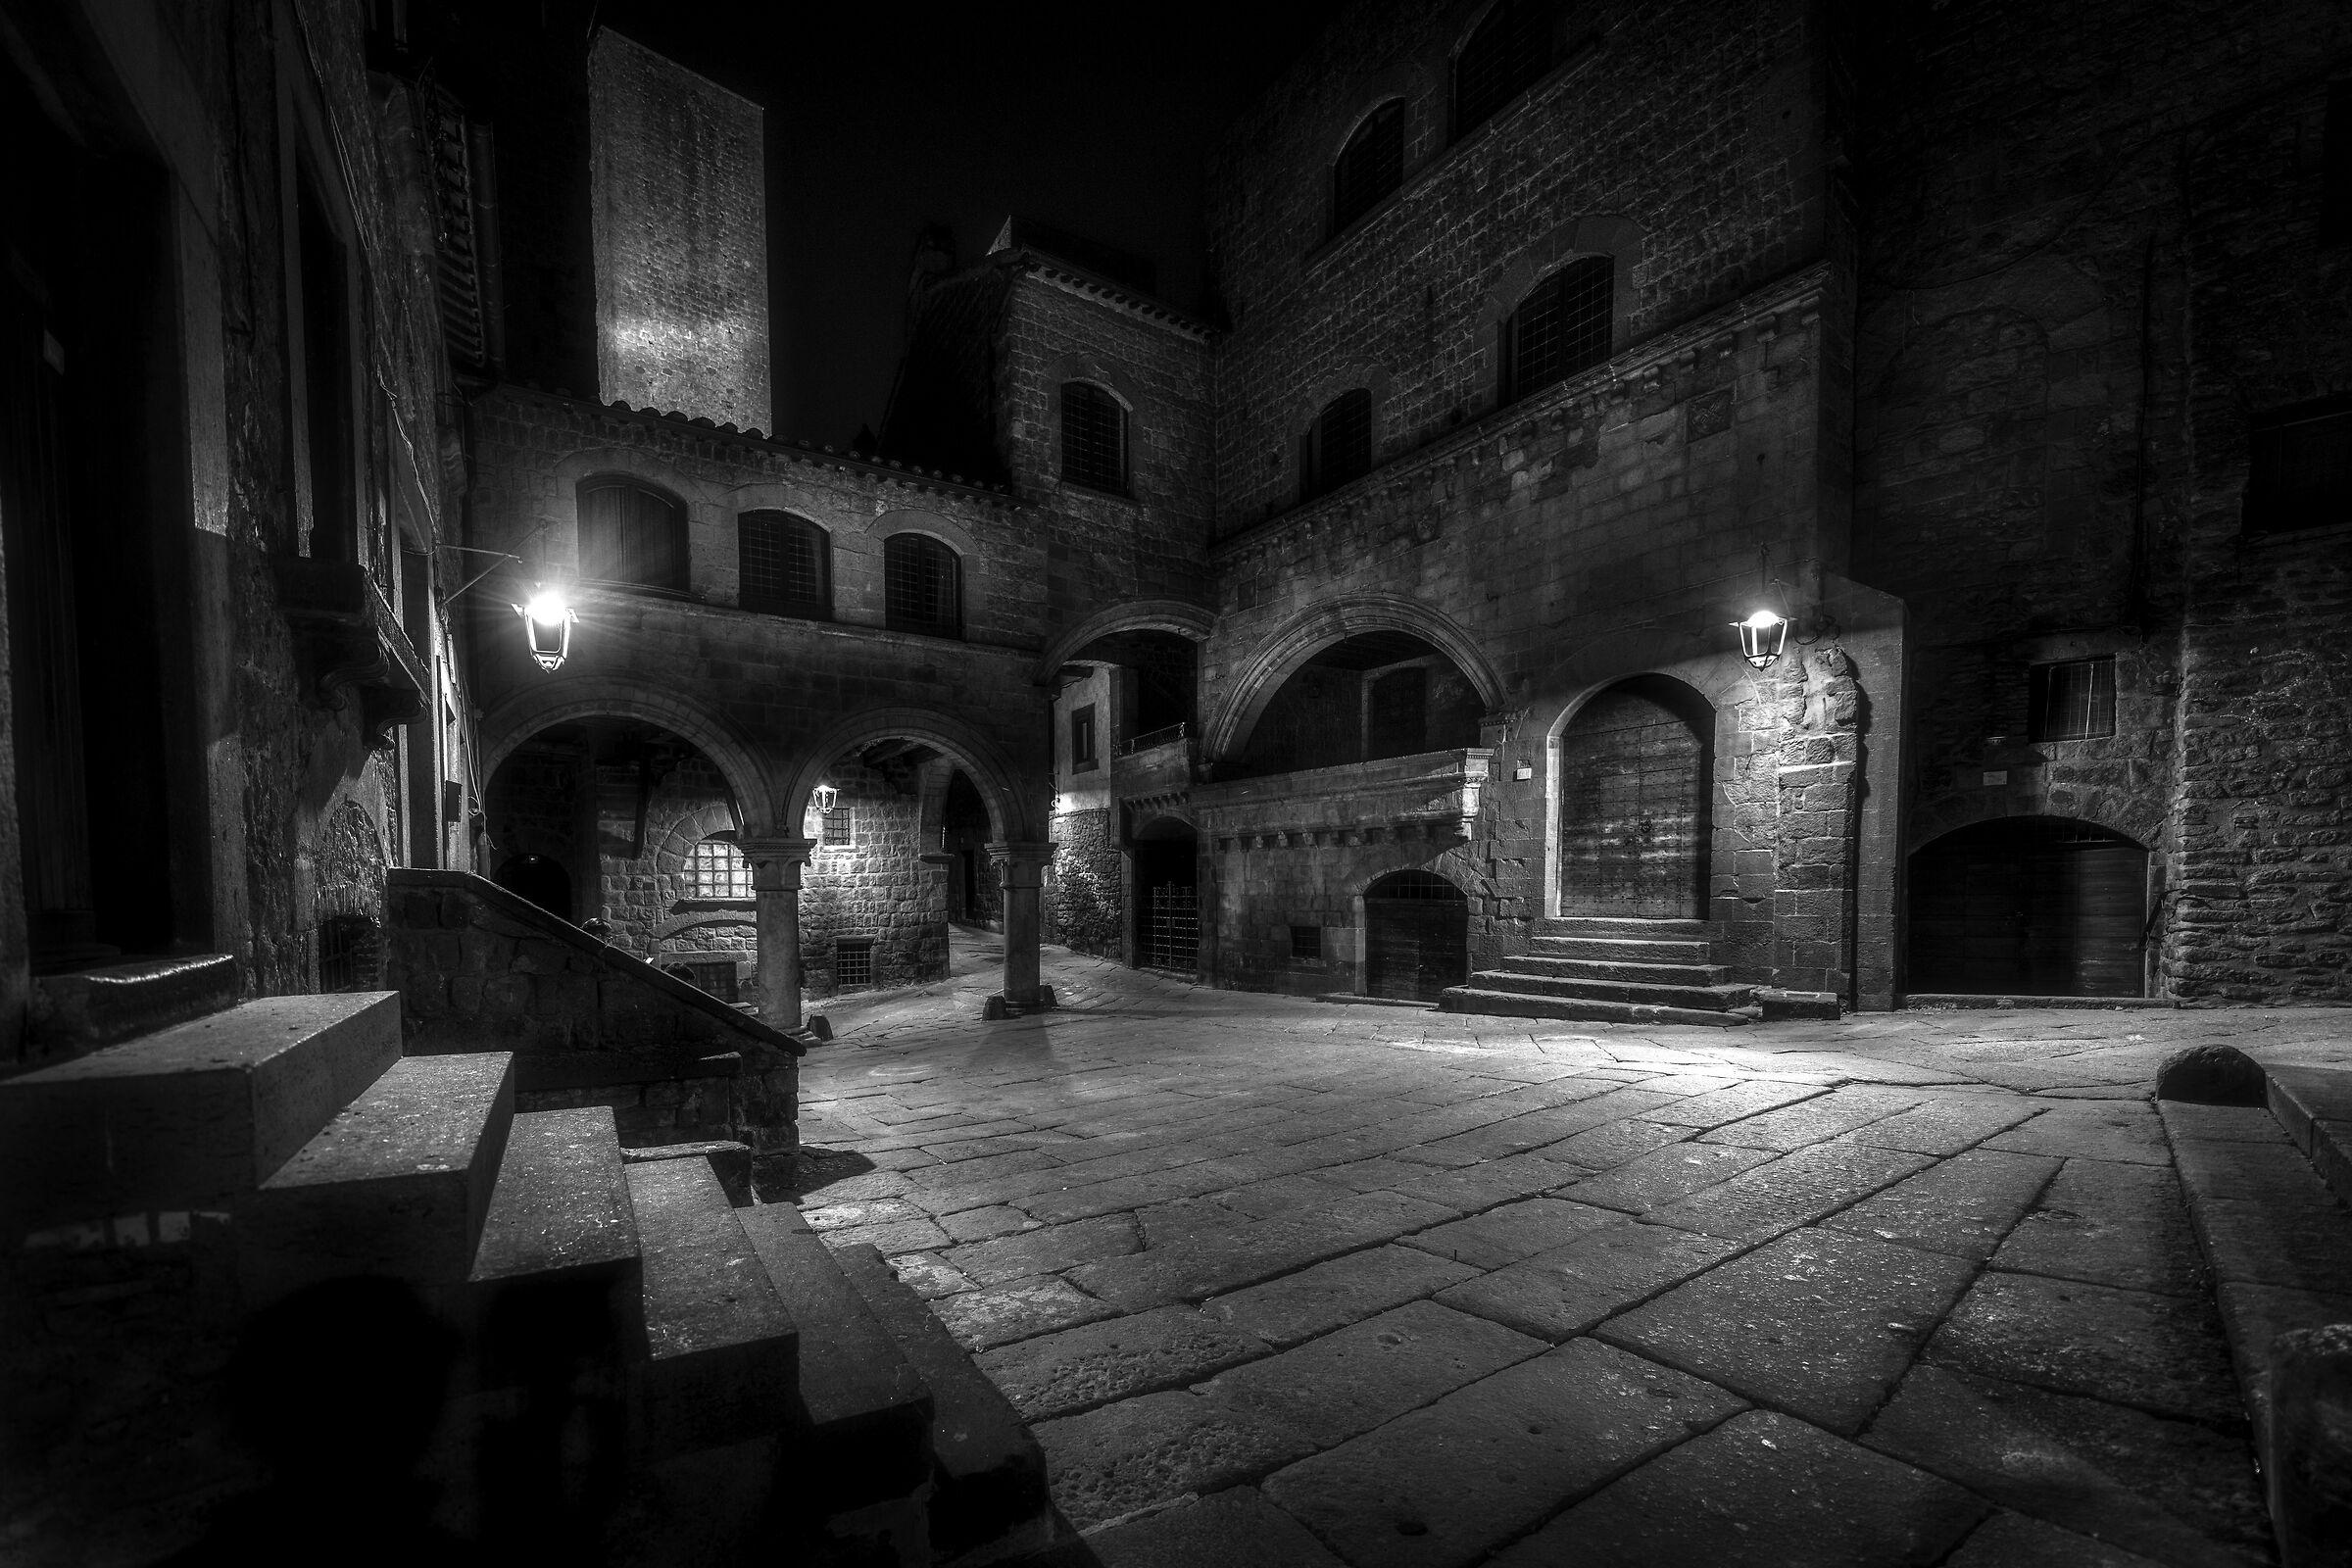 Piazza S. Pellegrino (Vt) - Italy...